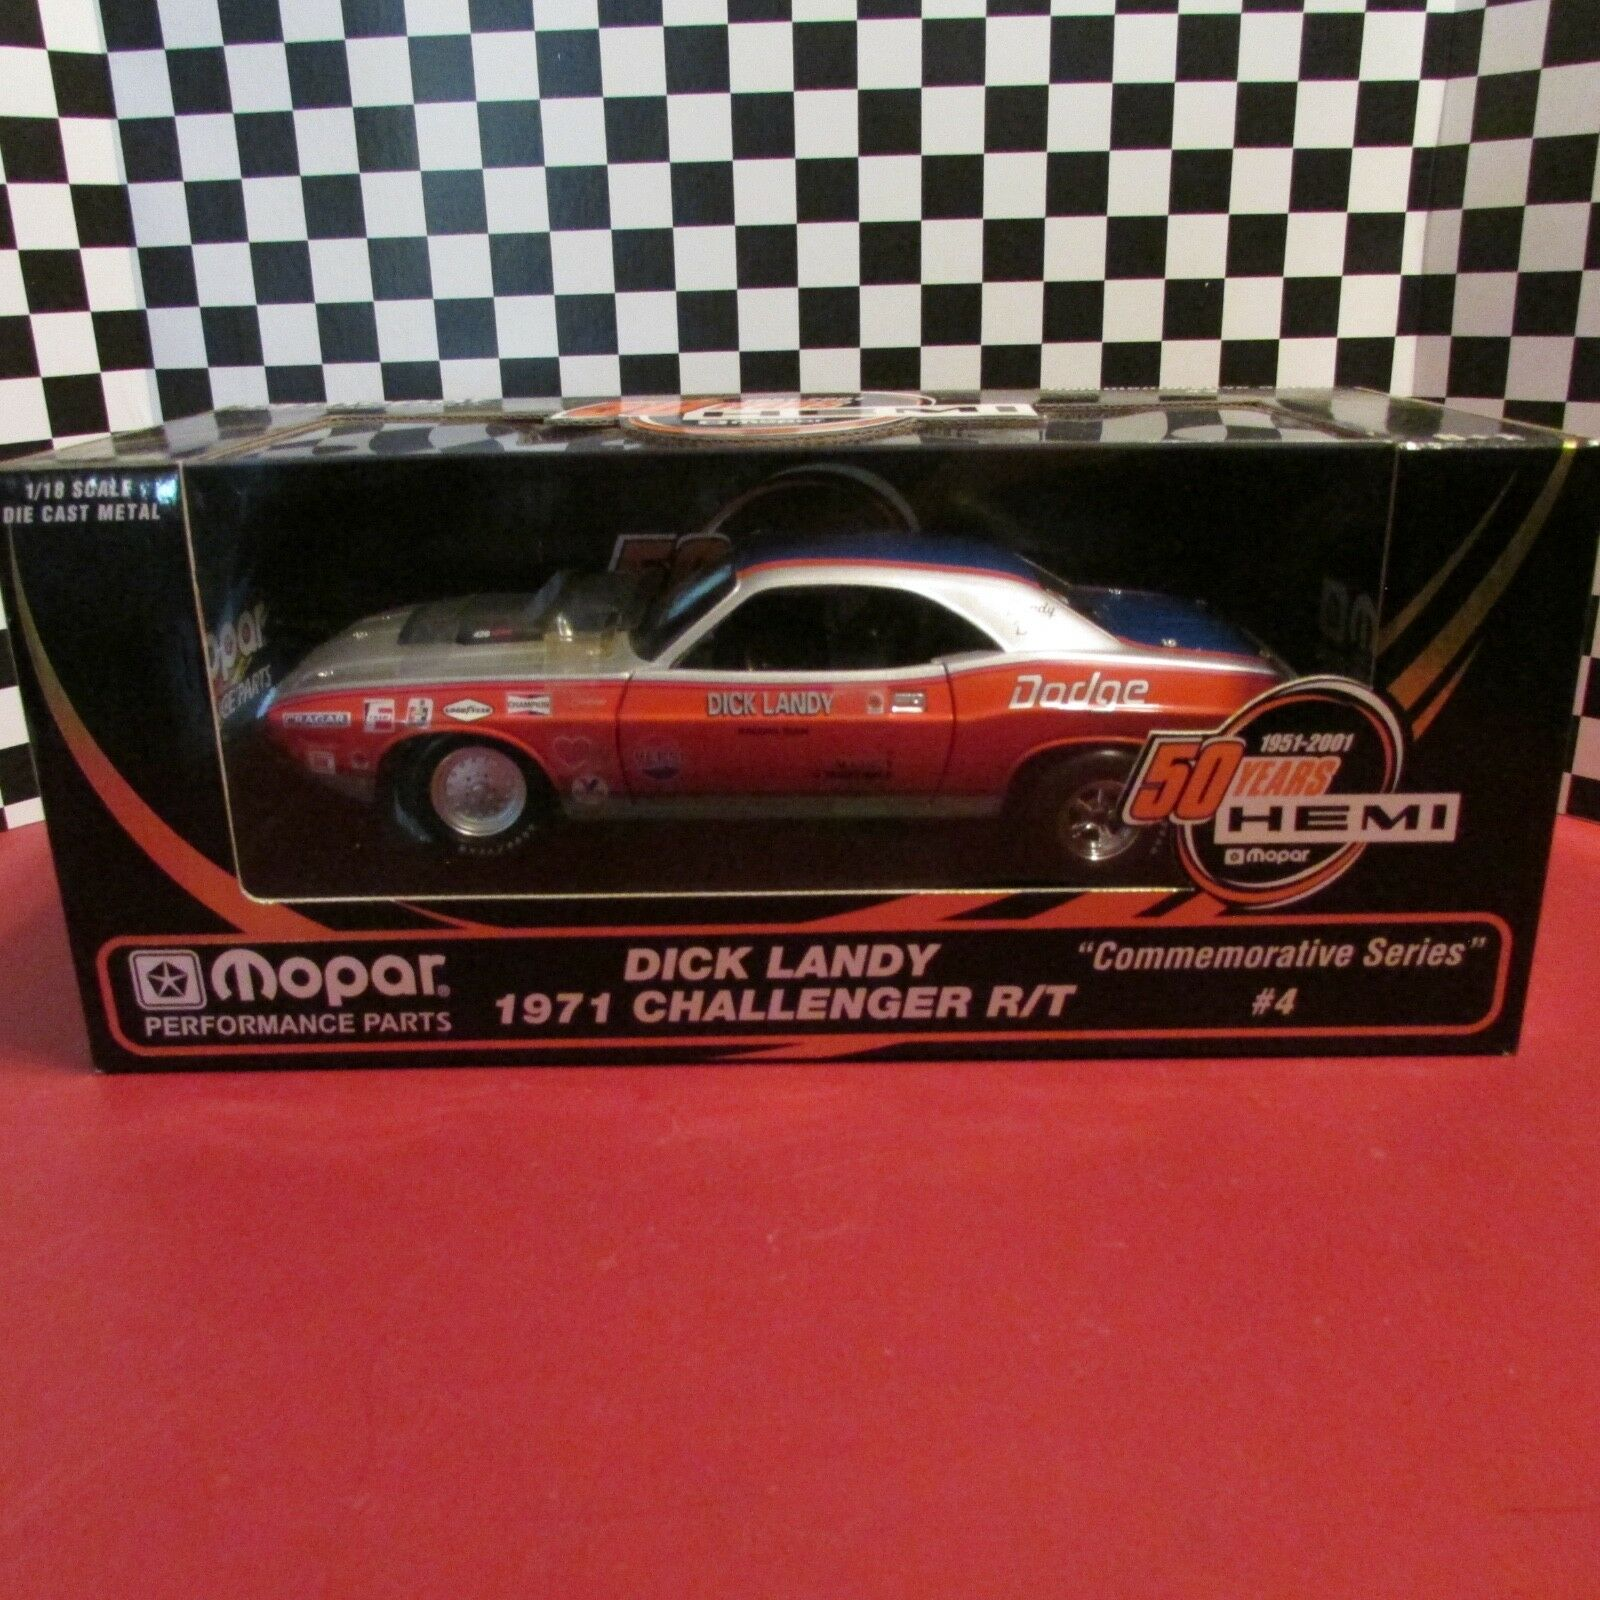 Ertl, 1971 dodge'hemi Challenger RT, Dick Landy carreras, Auto diecast escala 1:18